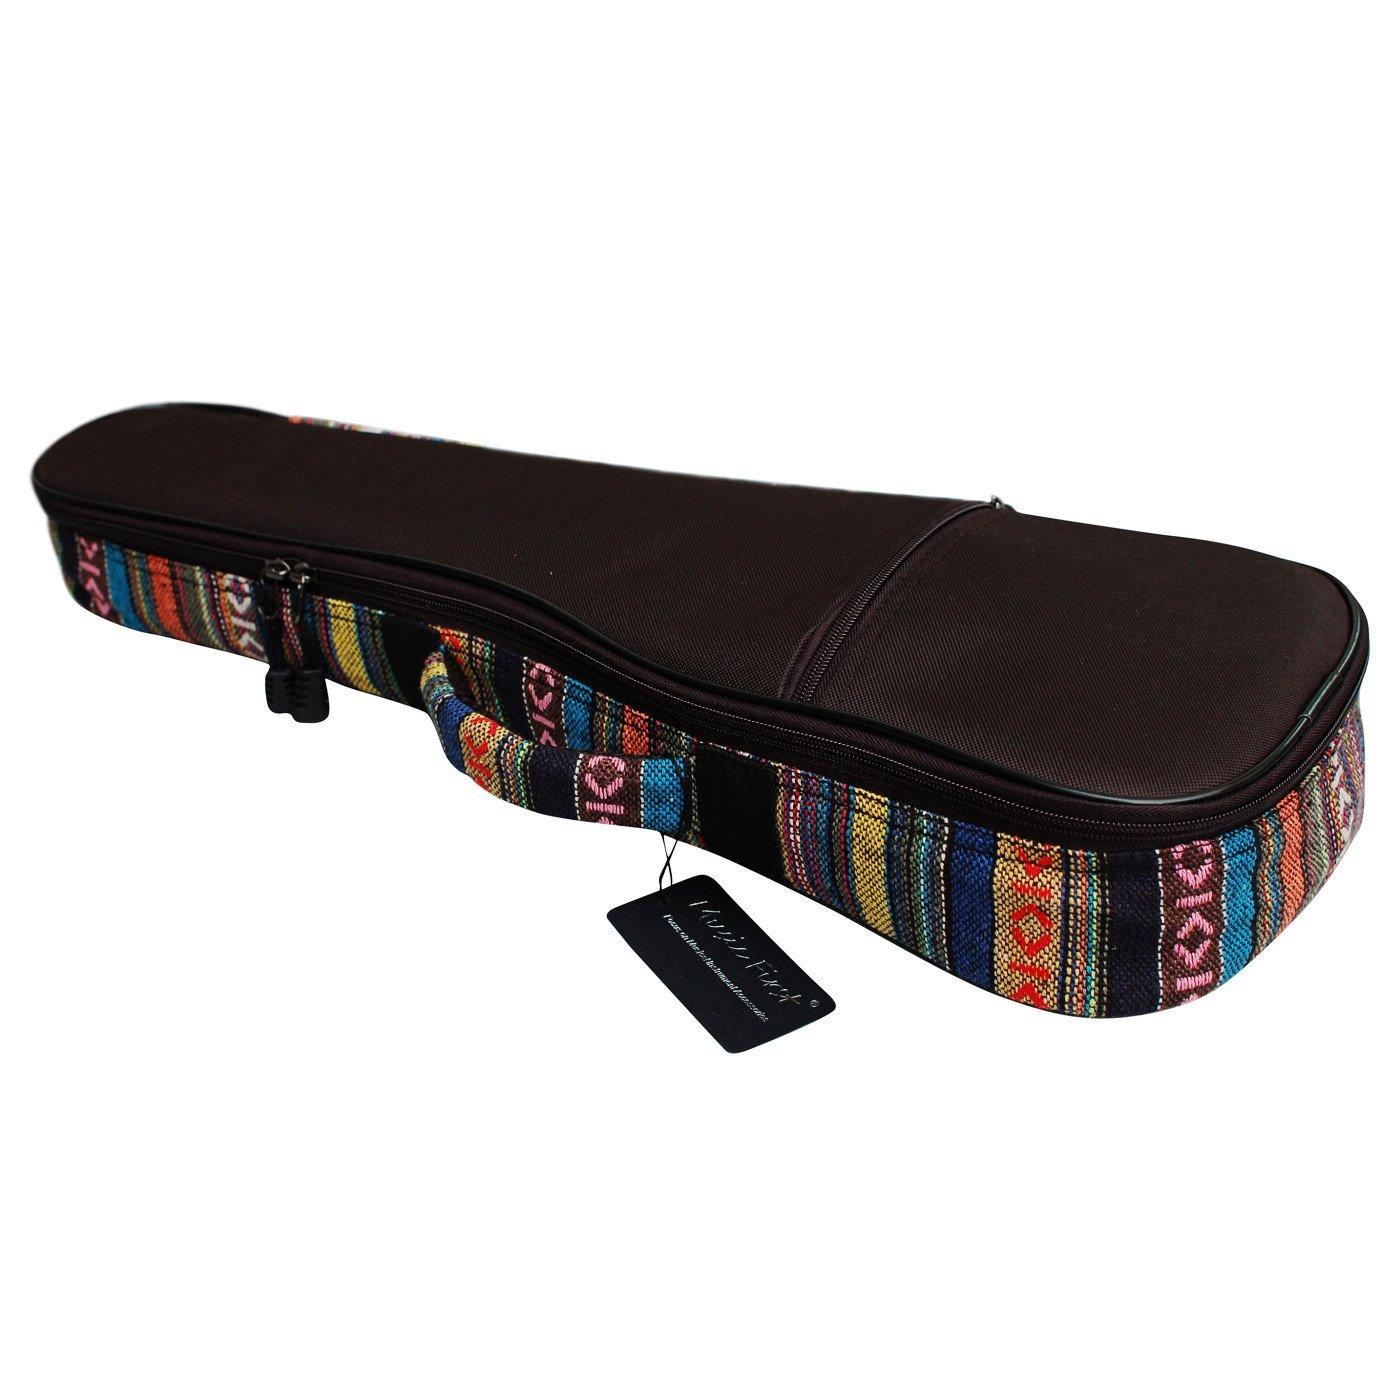 MUSIC FIRST 21'' Soprano Assorted Colors Country Style Ukulele Bags Gig Bags Ukulele Cases ukulele cover Version 1.1